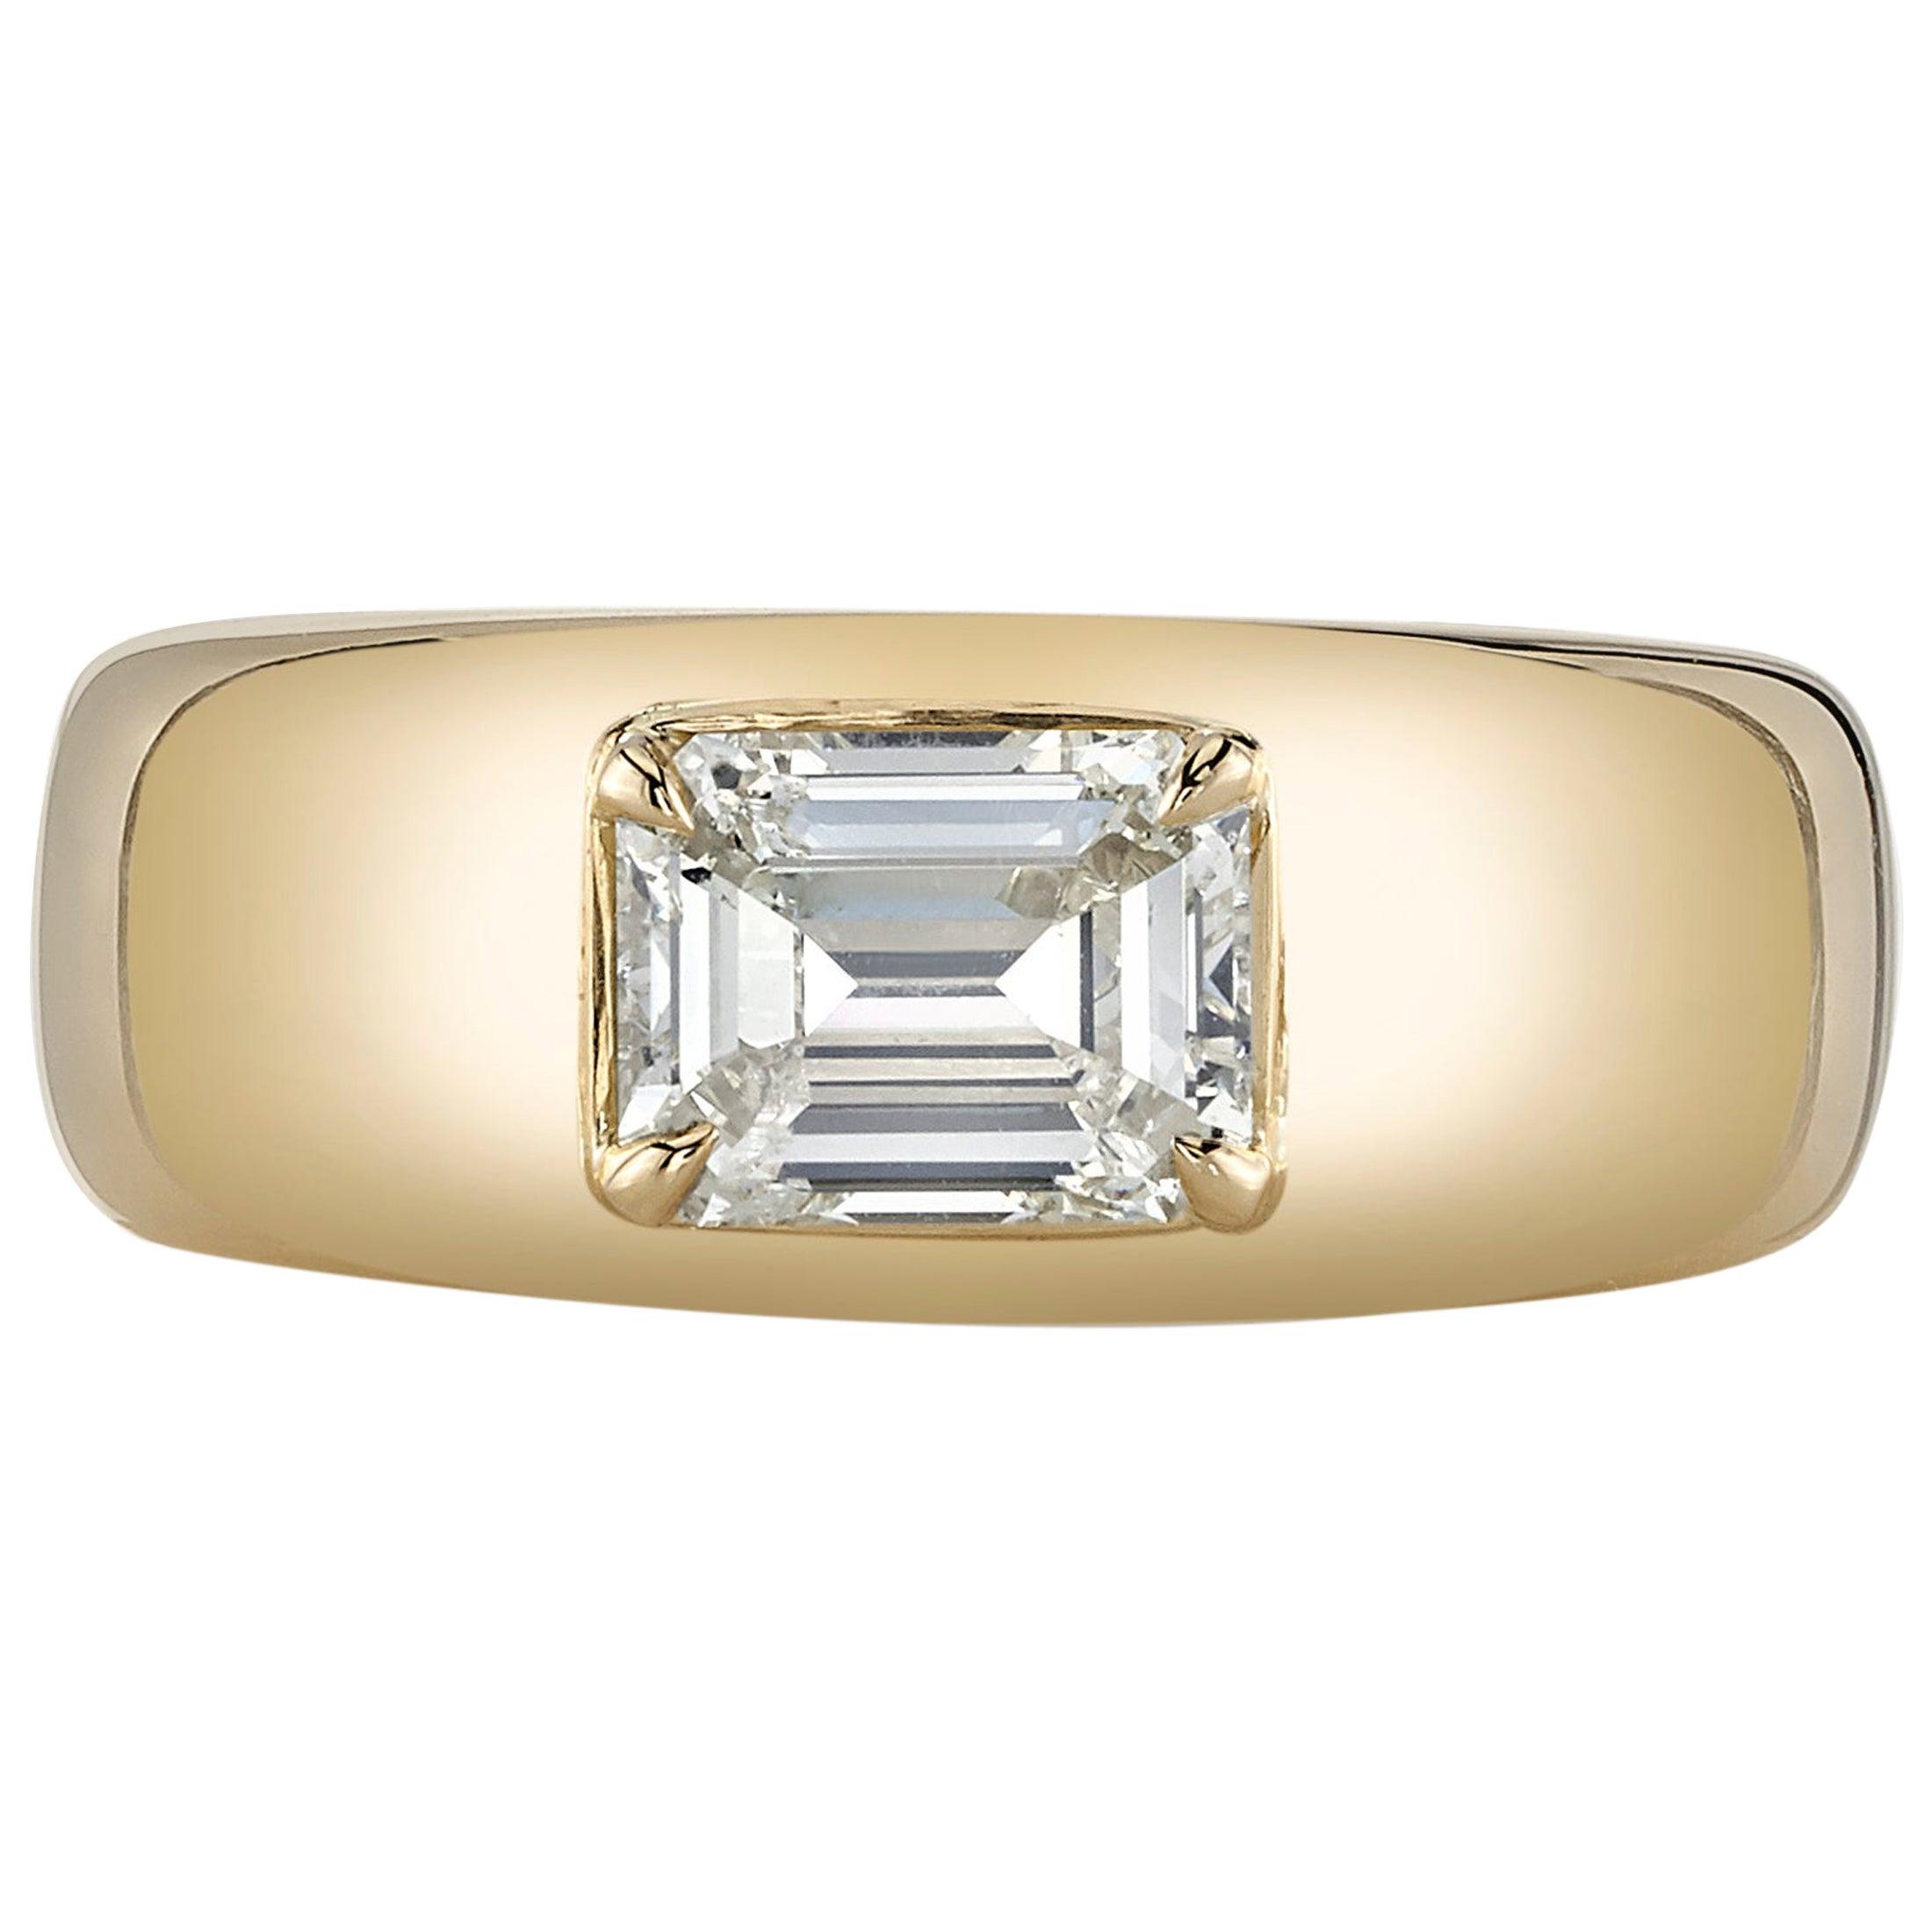 1.00 Carat Emerald Cut Diamond in a Handcrafted 18 Karat Yellow Gold Ring